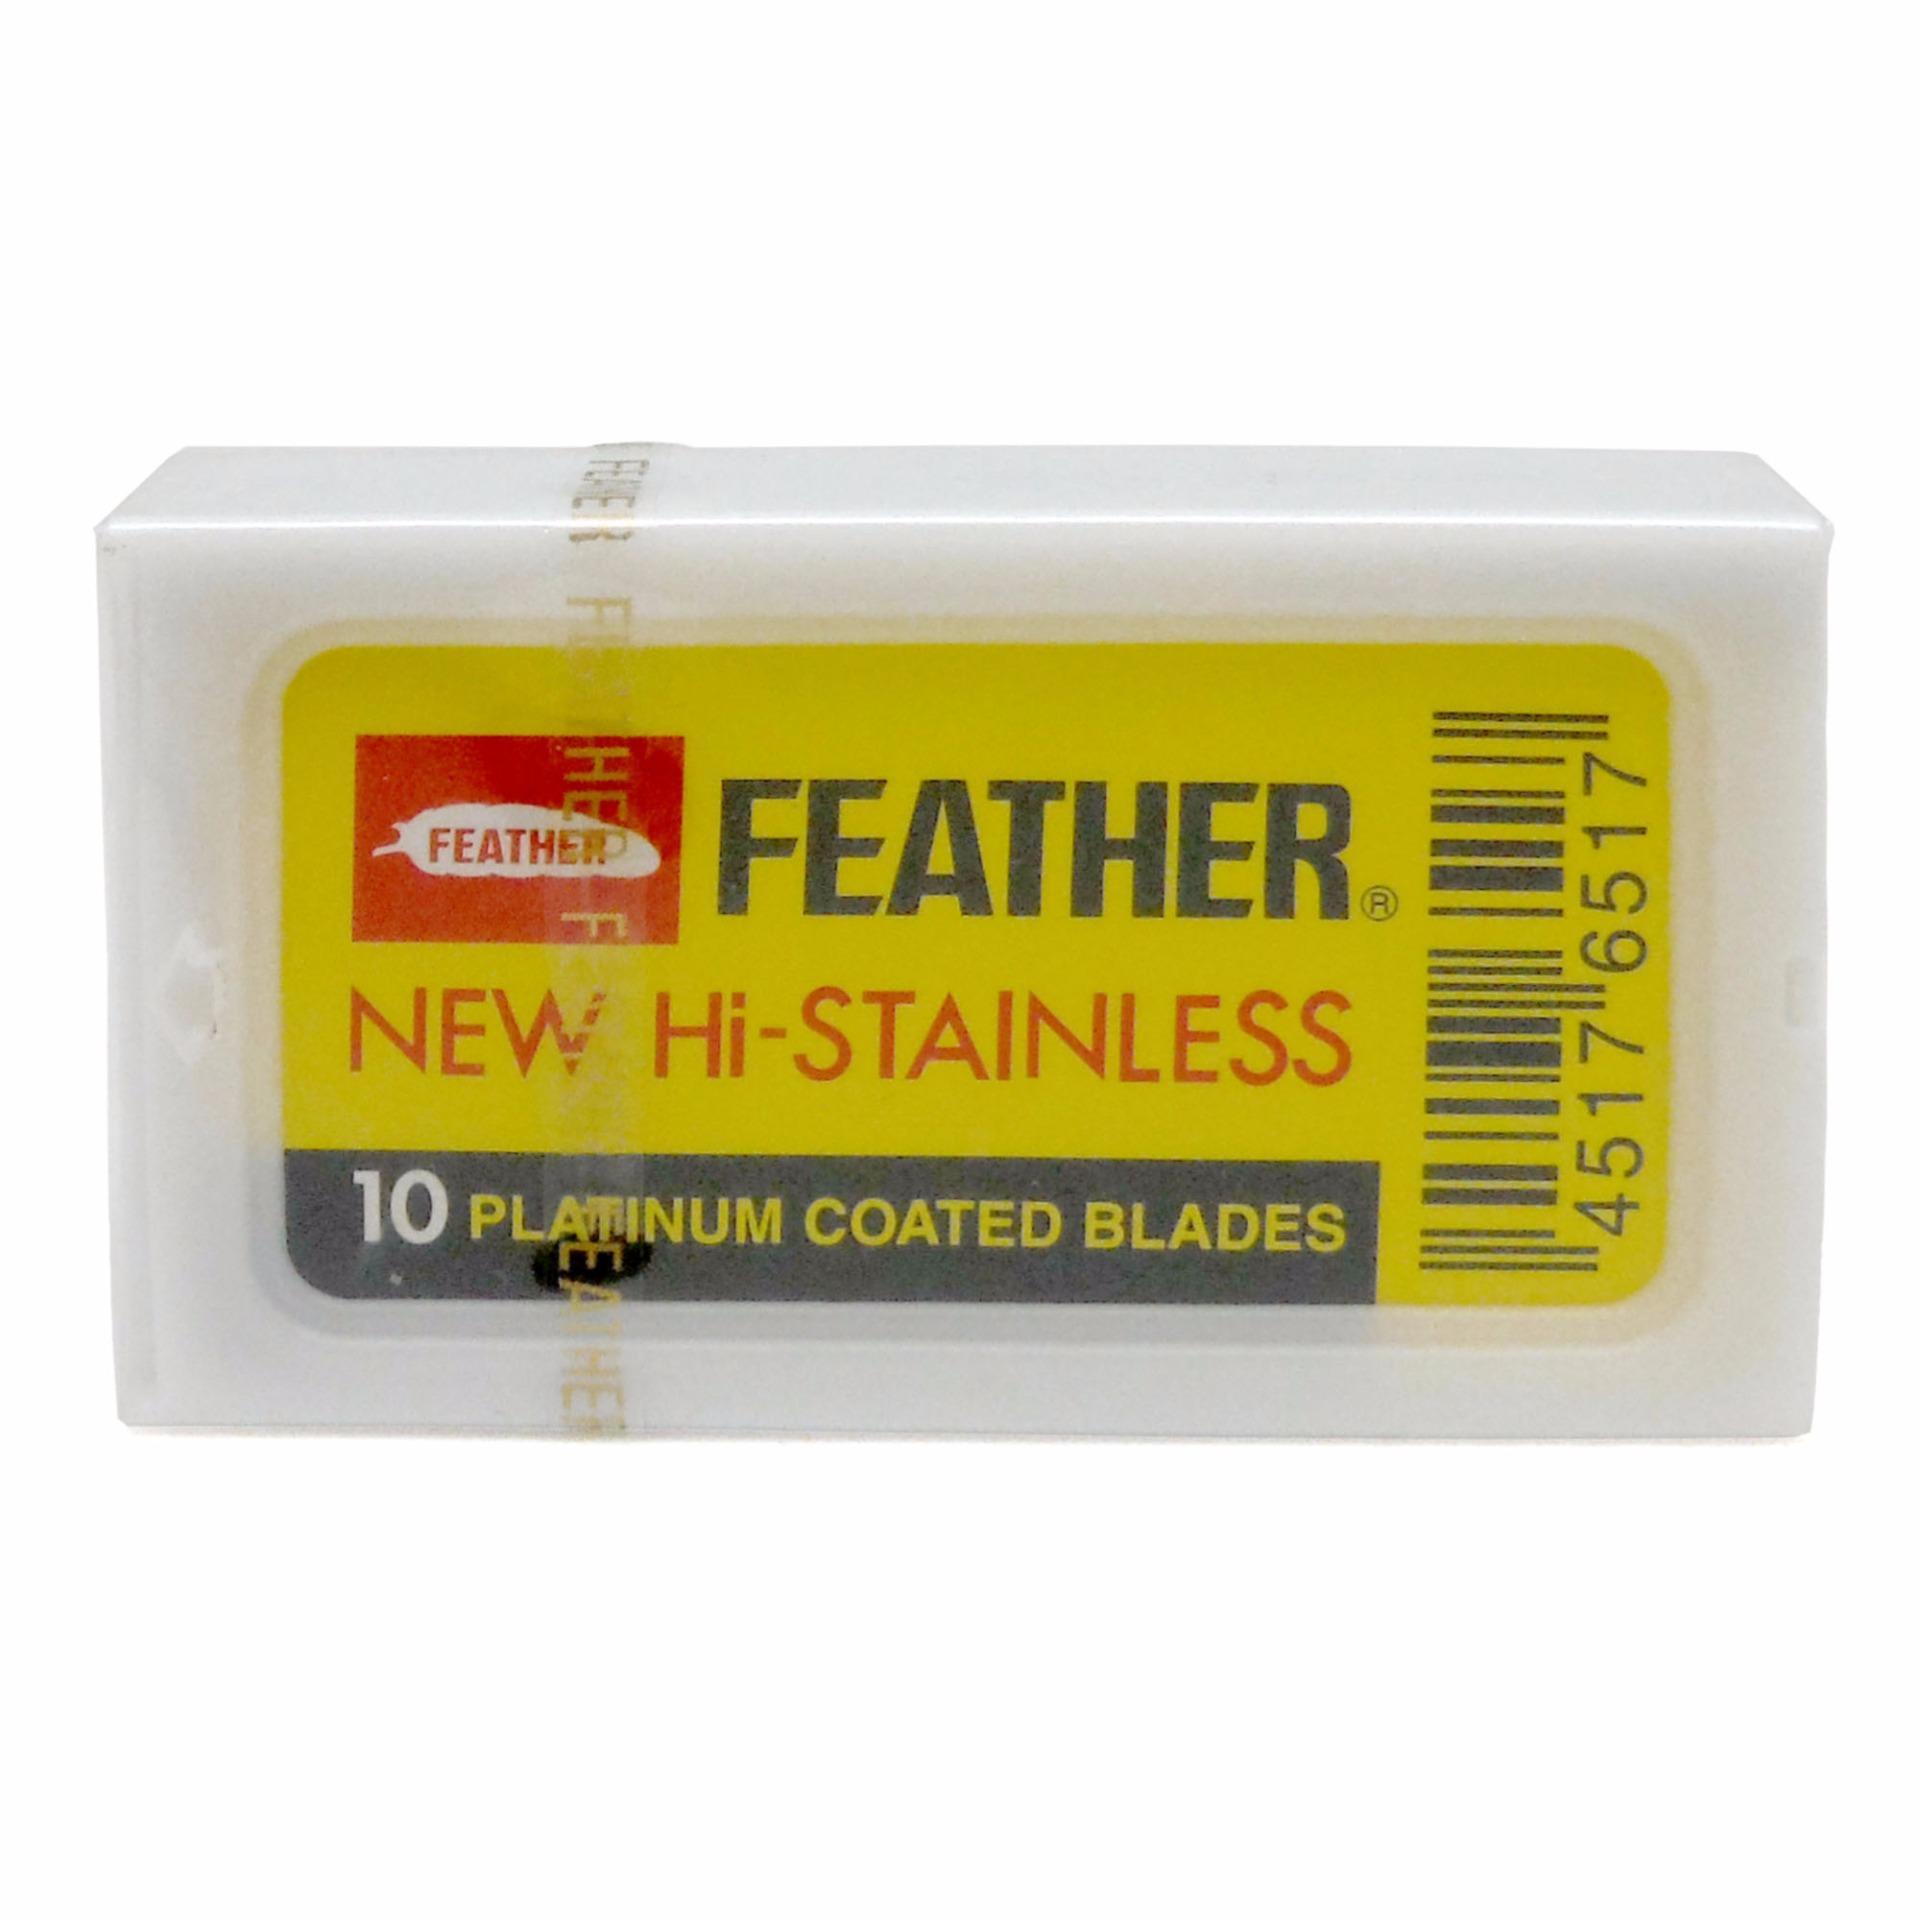 Feather Hi-Stainless Double Edge Razor Blades 10ct